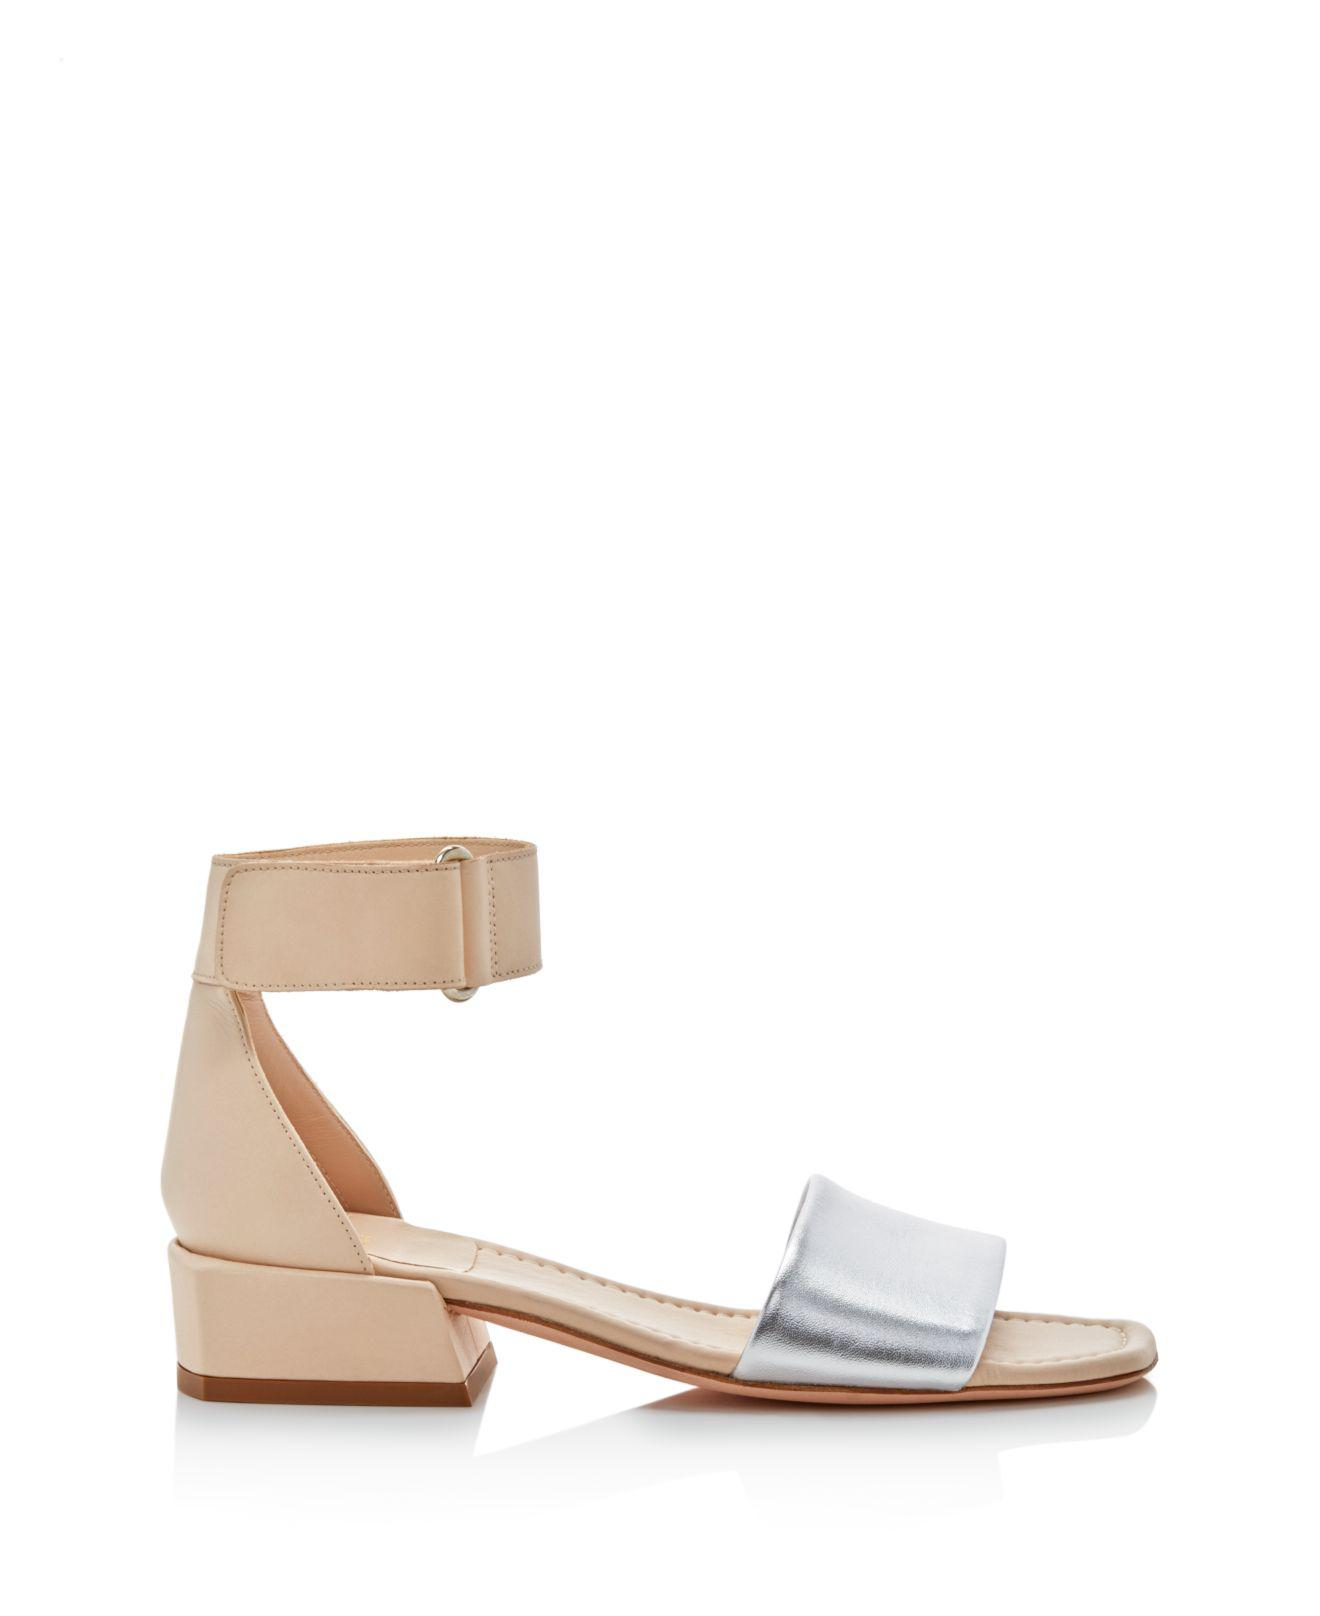 Stuart Weitzman Women's Oneway Leather Color-Block Sandals OwOCdhd2